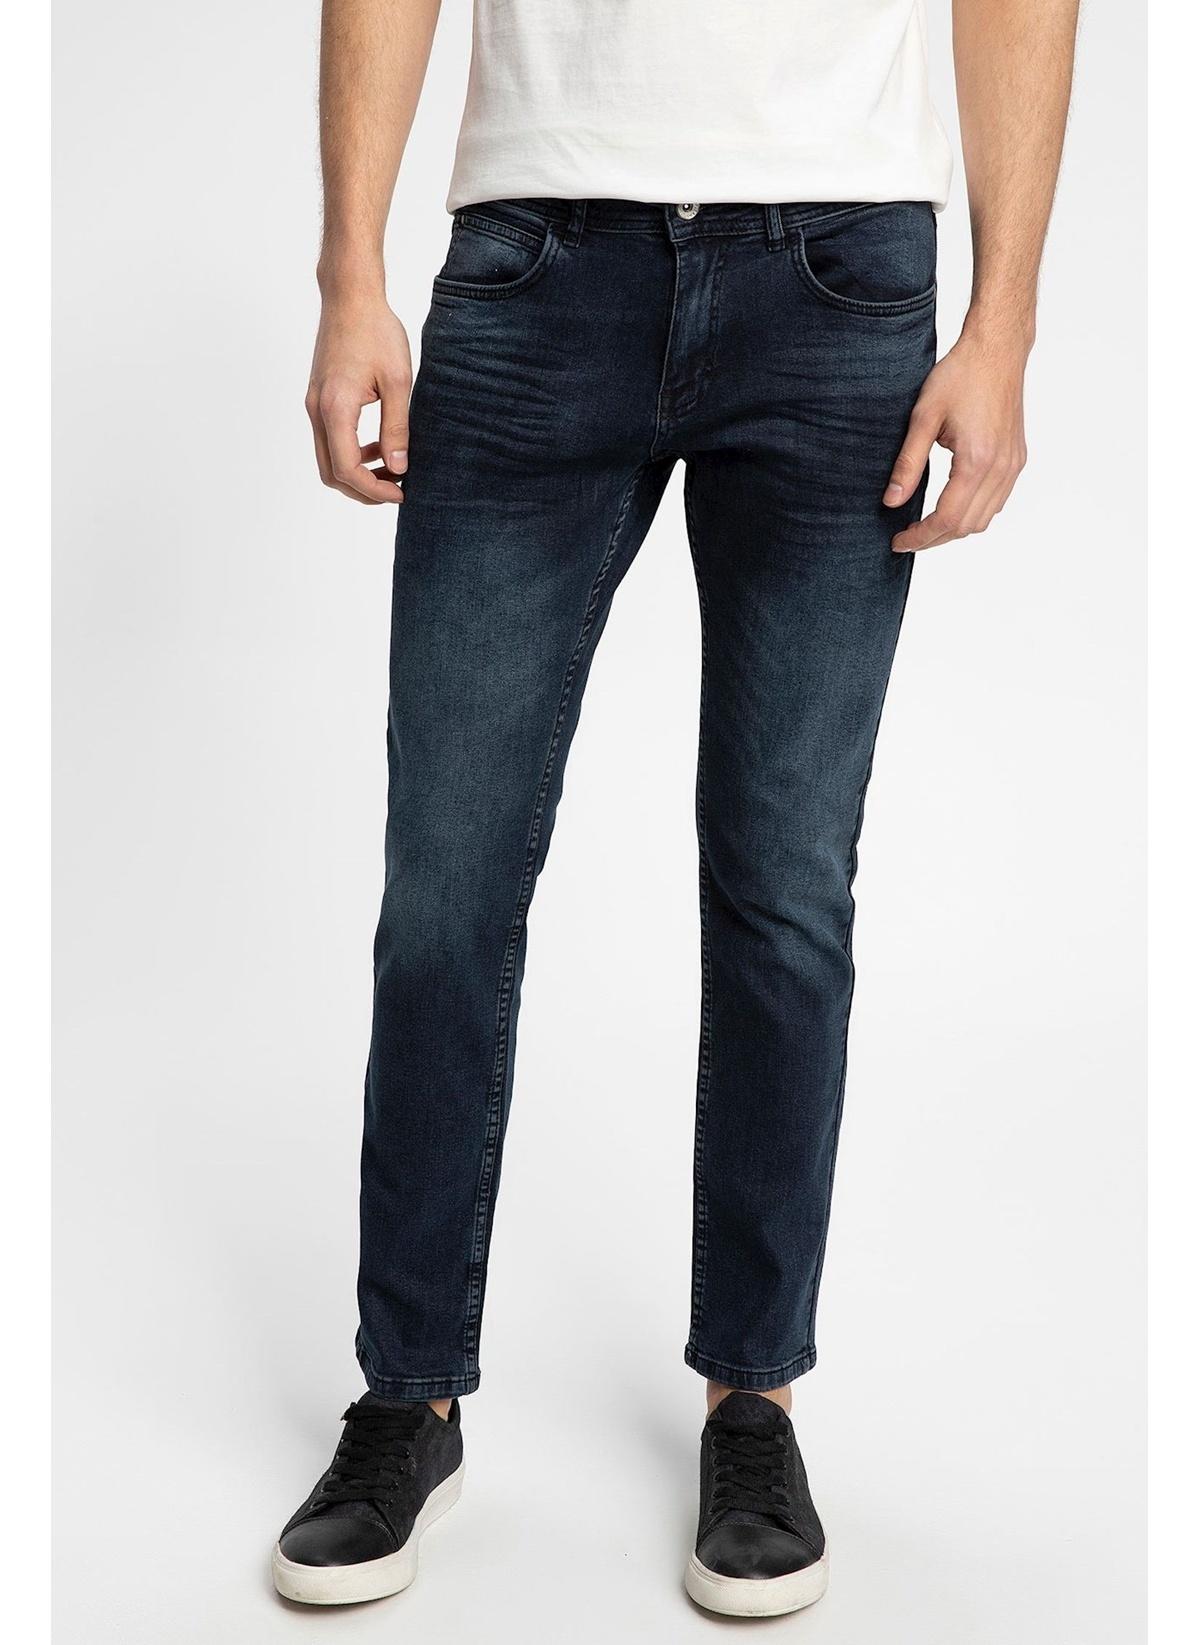 Defacto Sergio Regular Fit Denim Pantolon K4119az19spın196 Denim – 99.99 TL